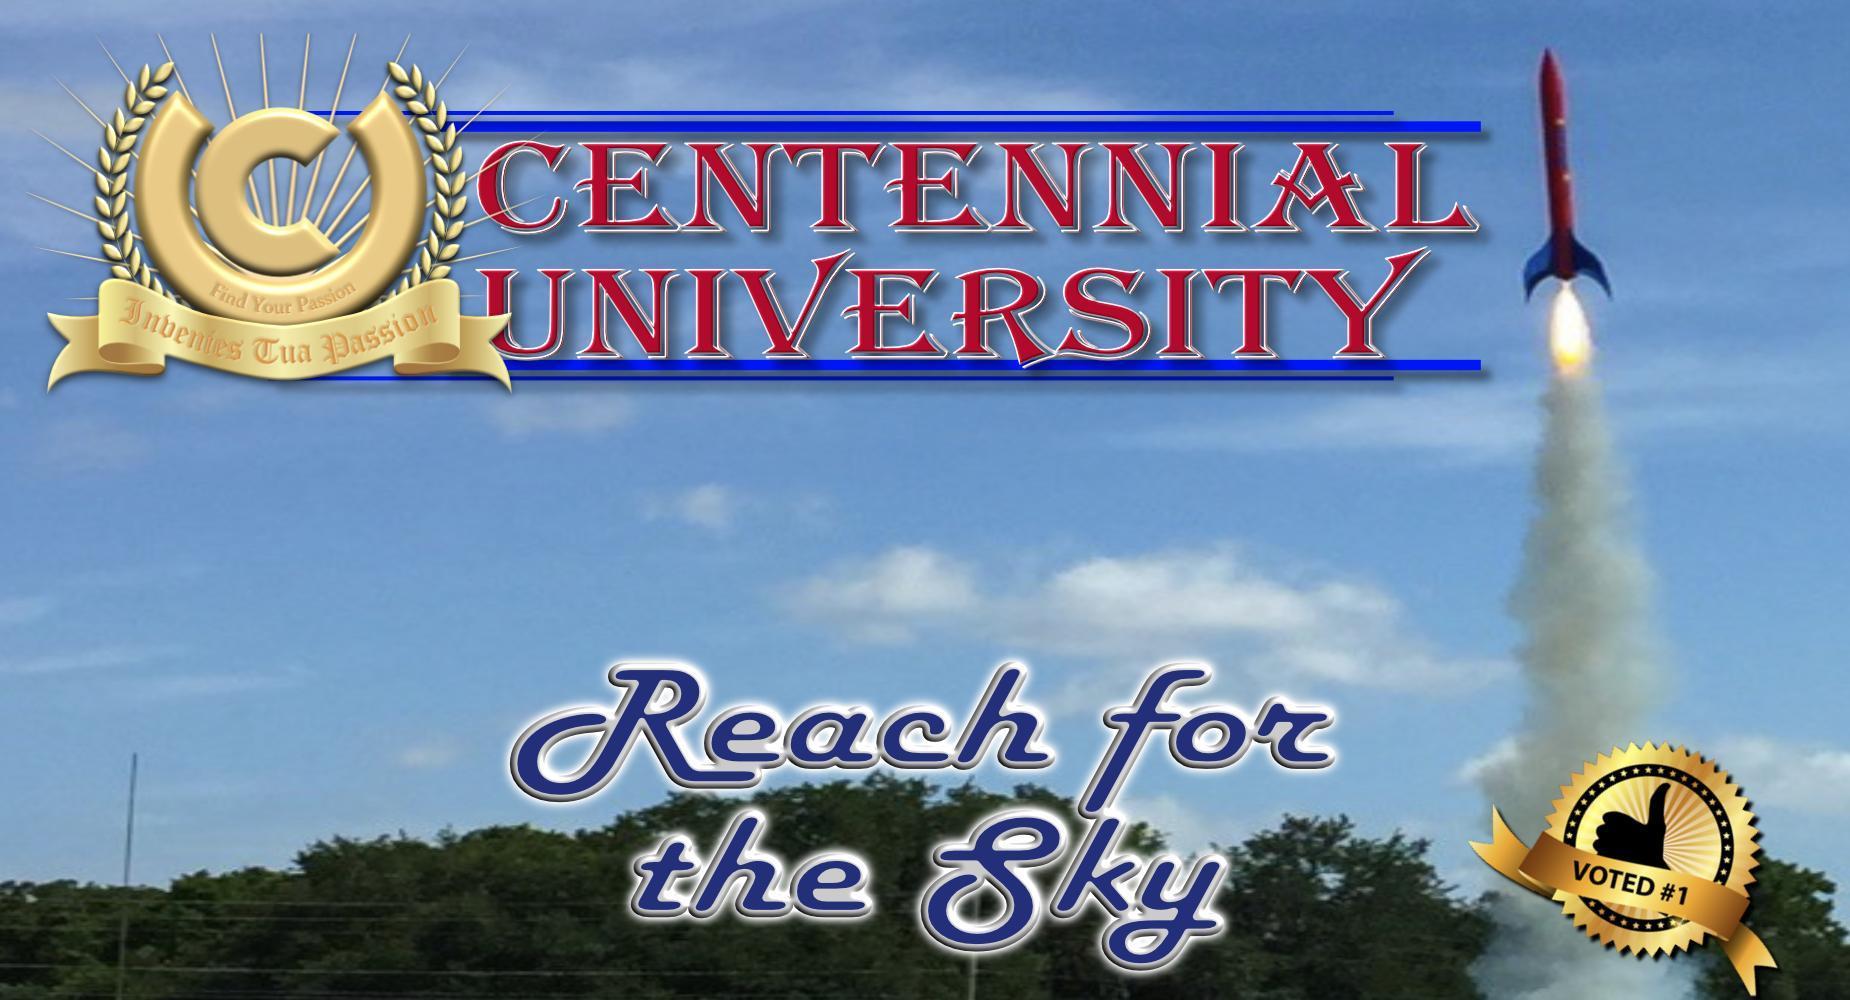 Centennial University - Reach for the Sky